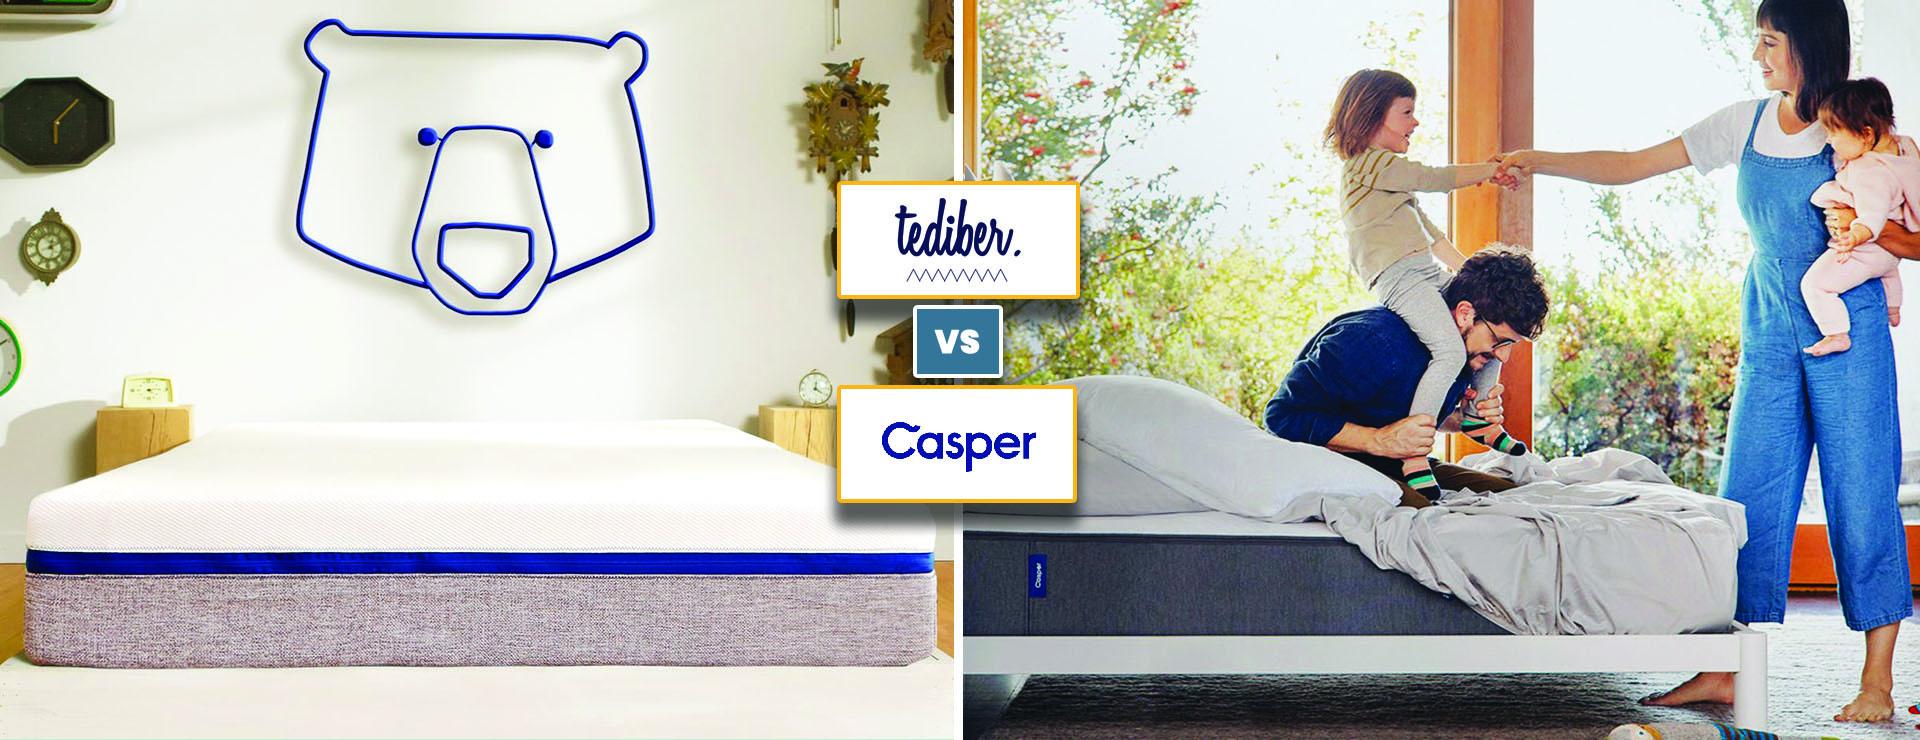 Tediber vs Casper